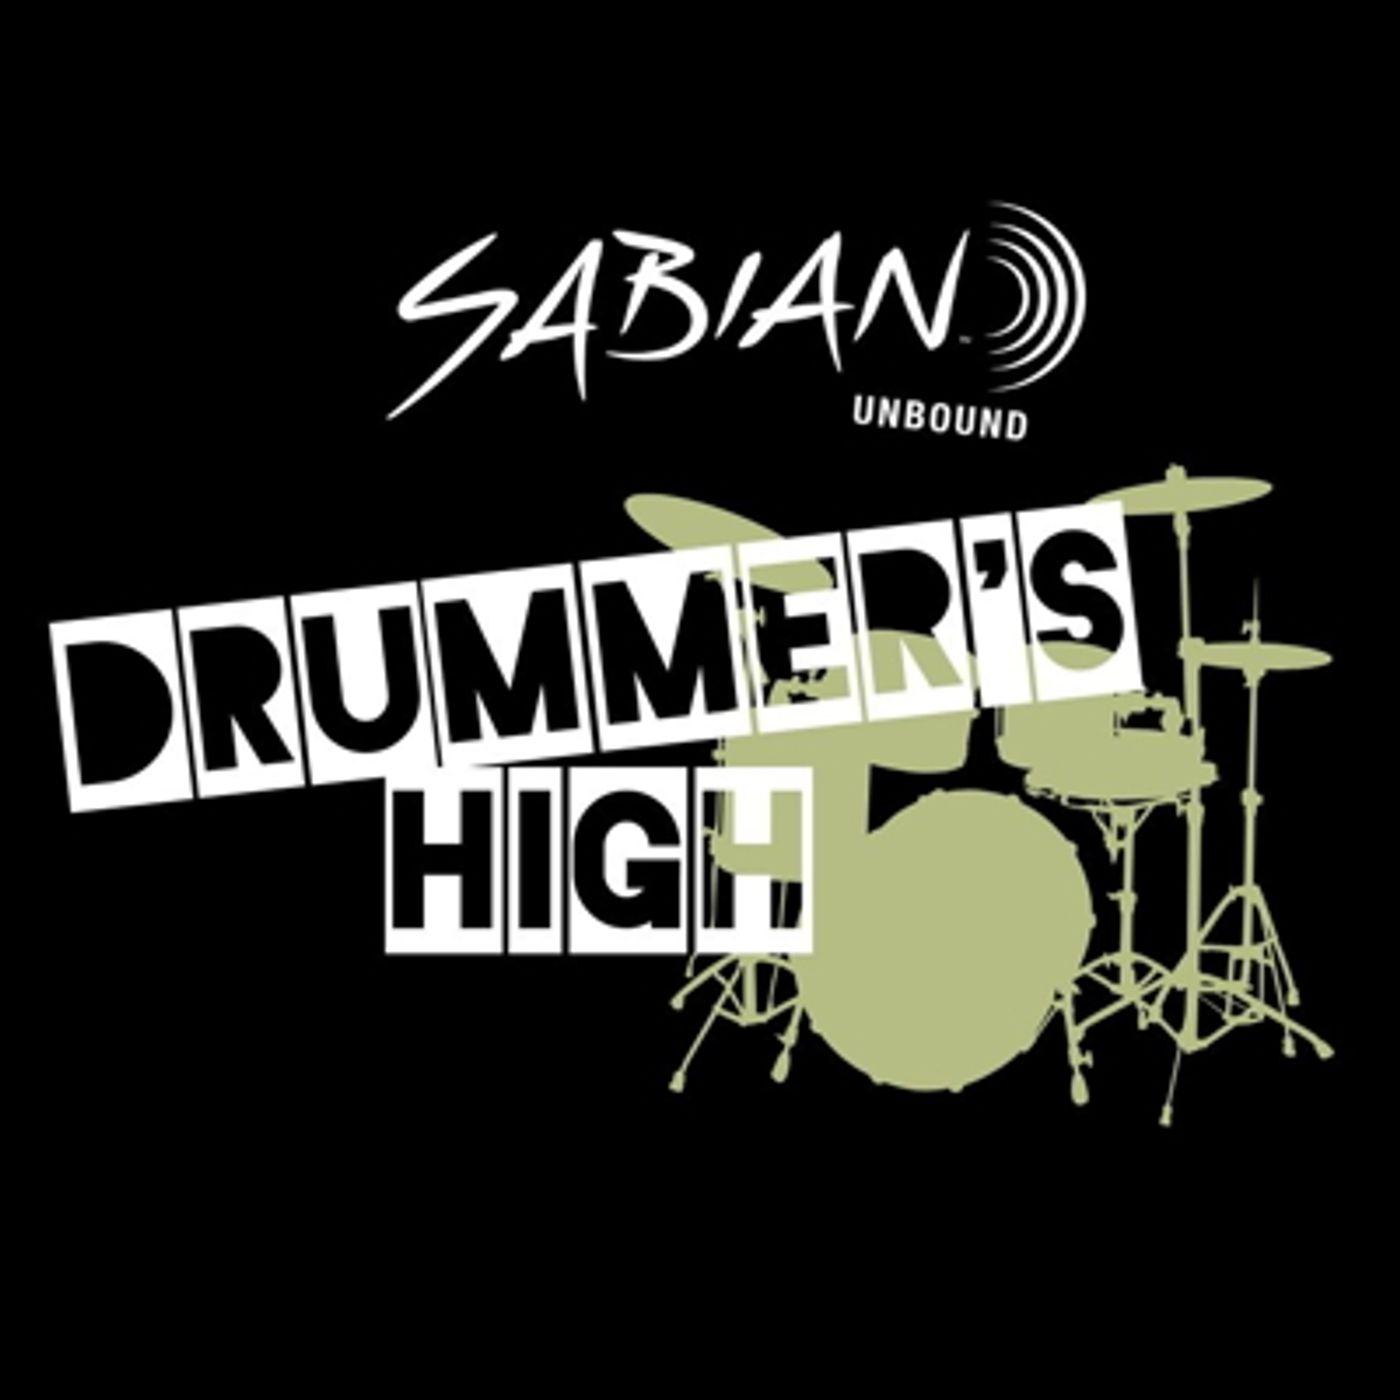 Drummer's High